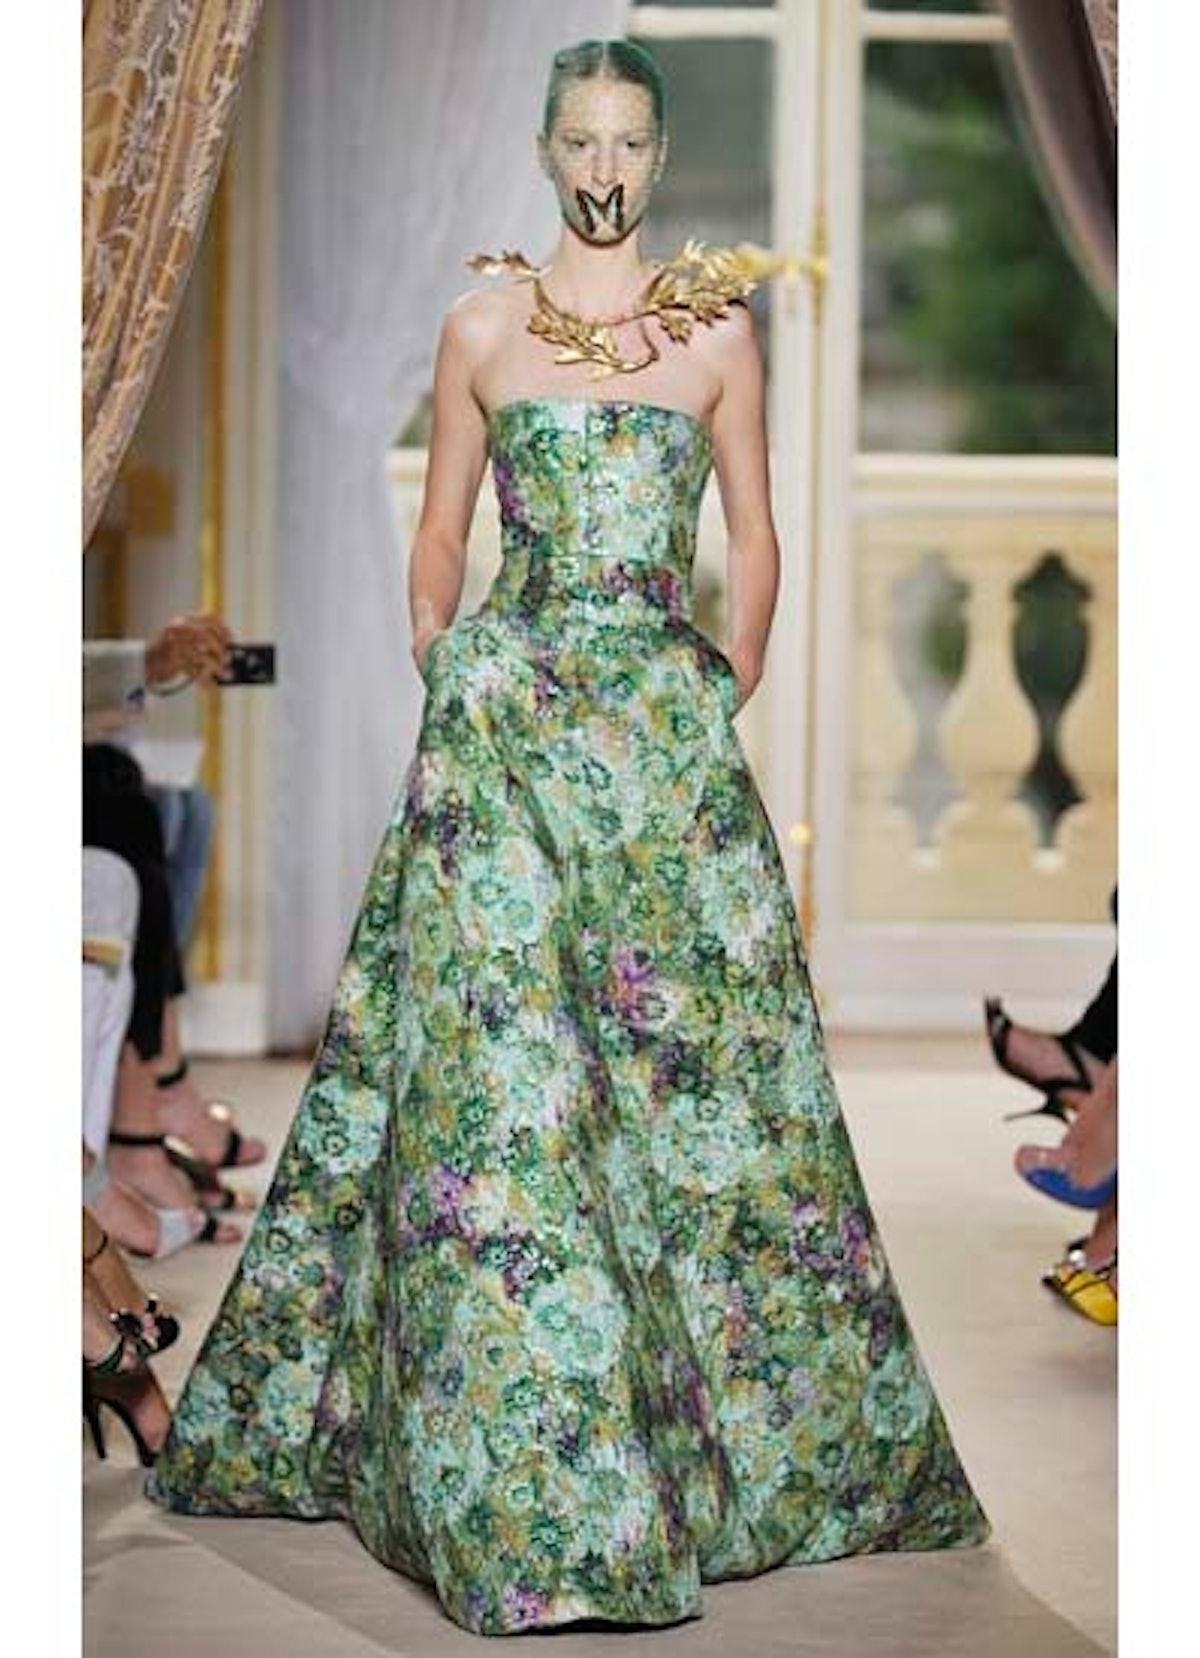 fass-giambattista-valli-couture-2012-runway-29-v.jpg